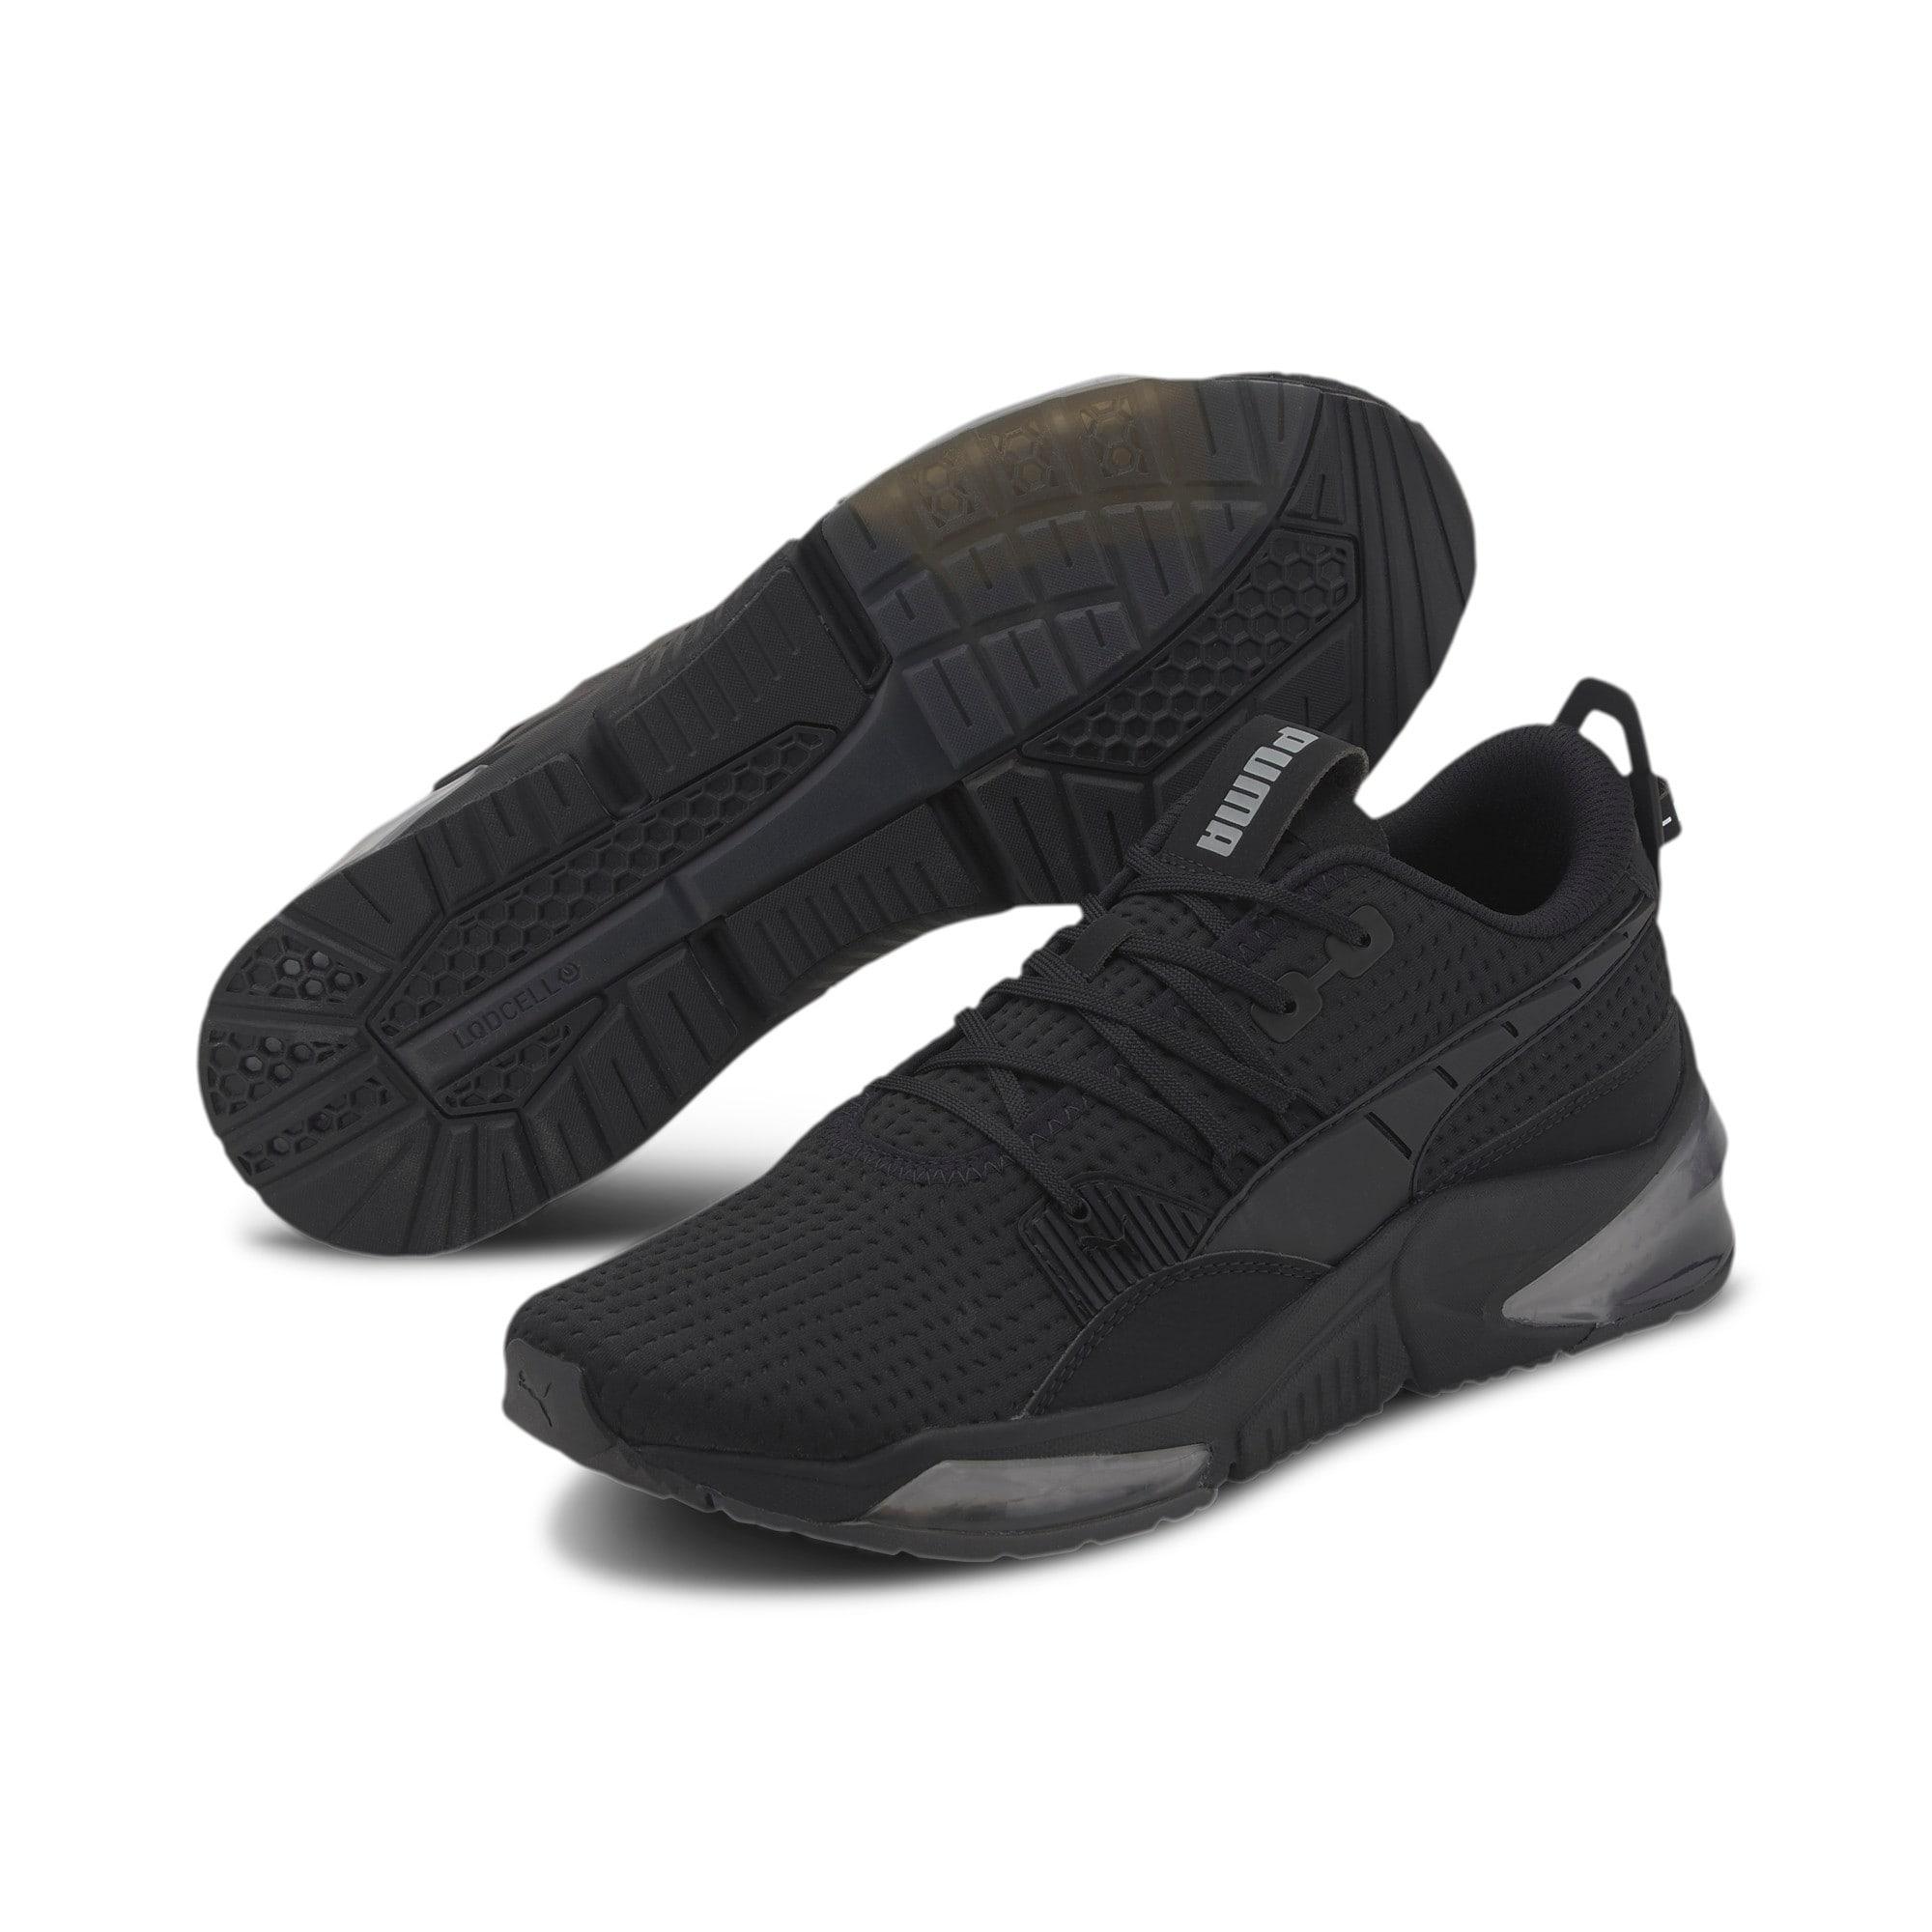 Thumbnail 3 of LQDCELL Optic Flight Suit Men's Training Shoes, Puma Black, medium